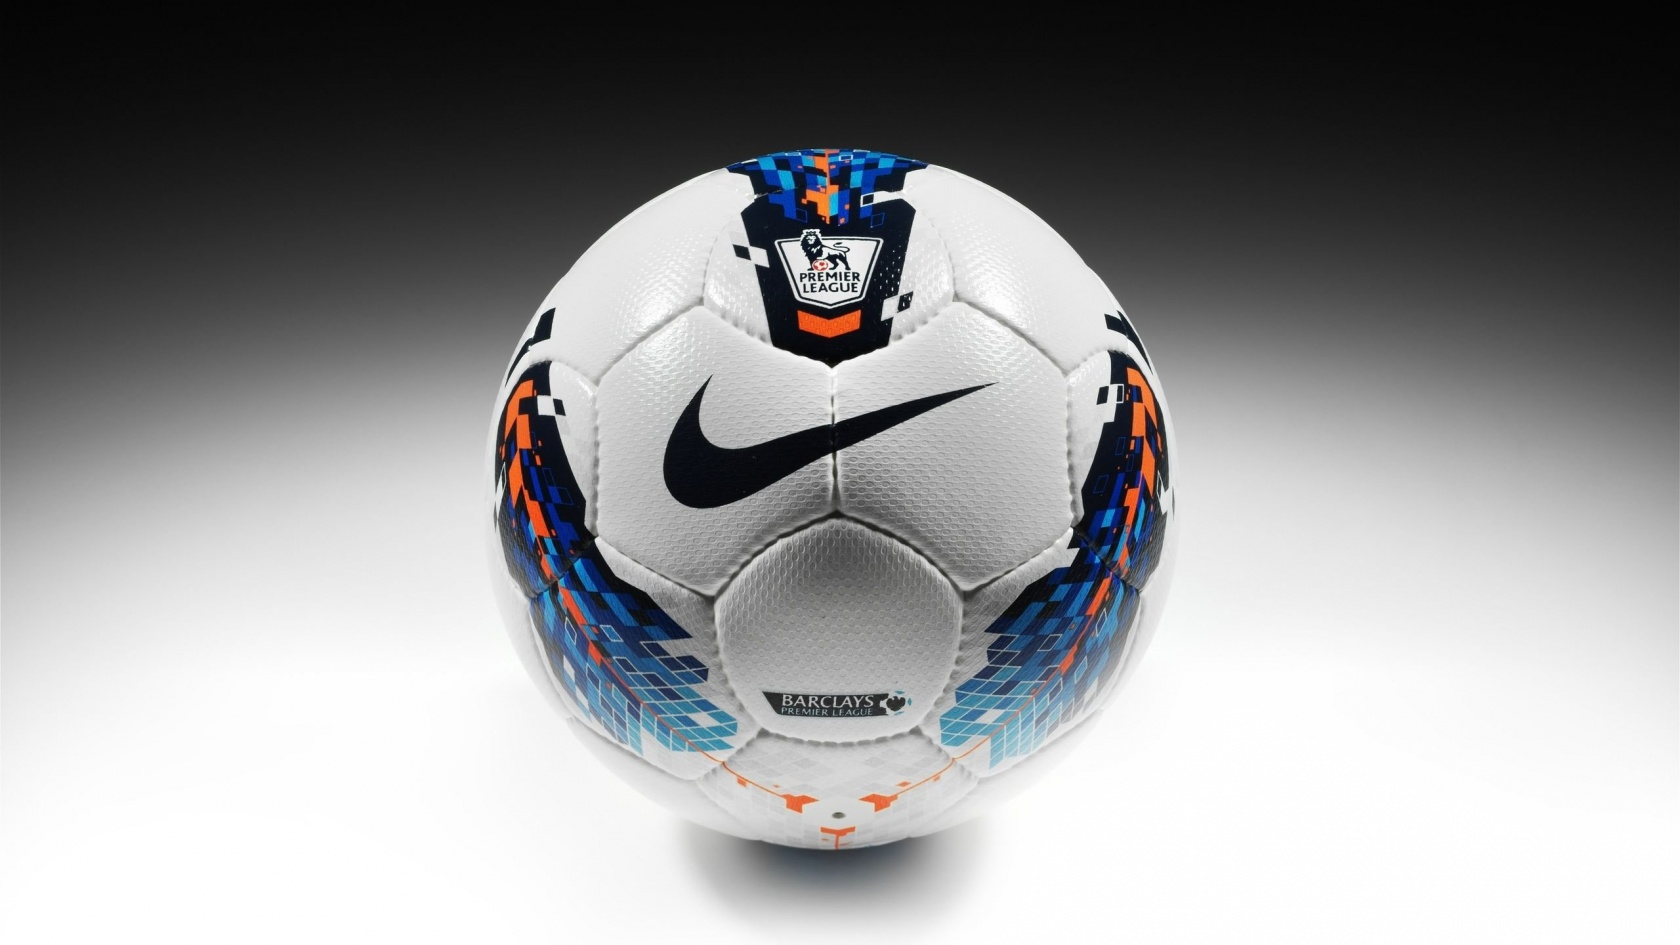 Barclays Nike Football Wallpapers   9900 1680x945